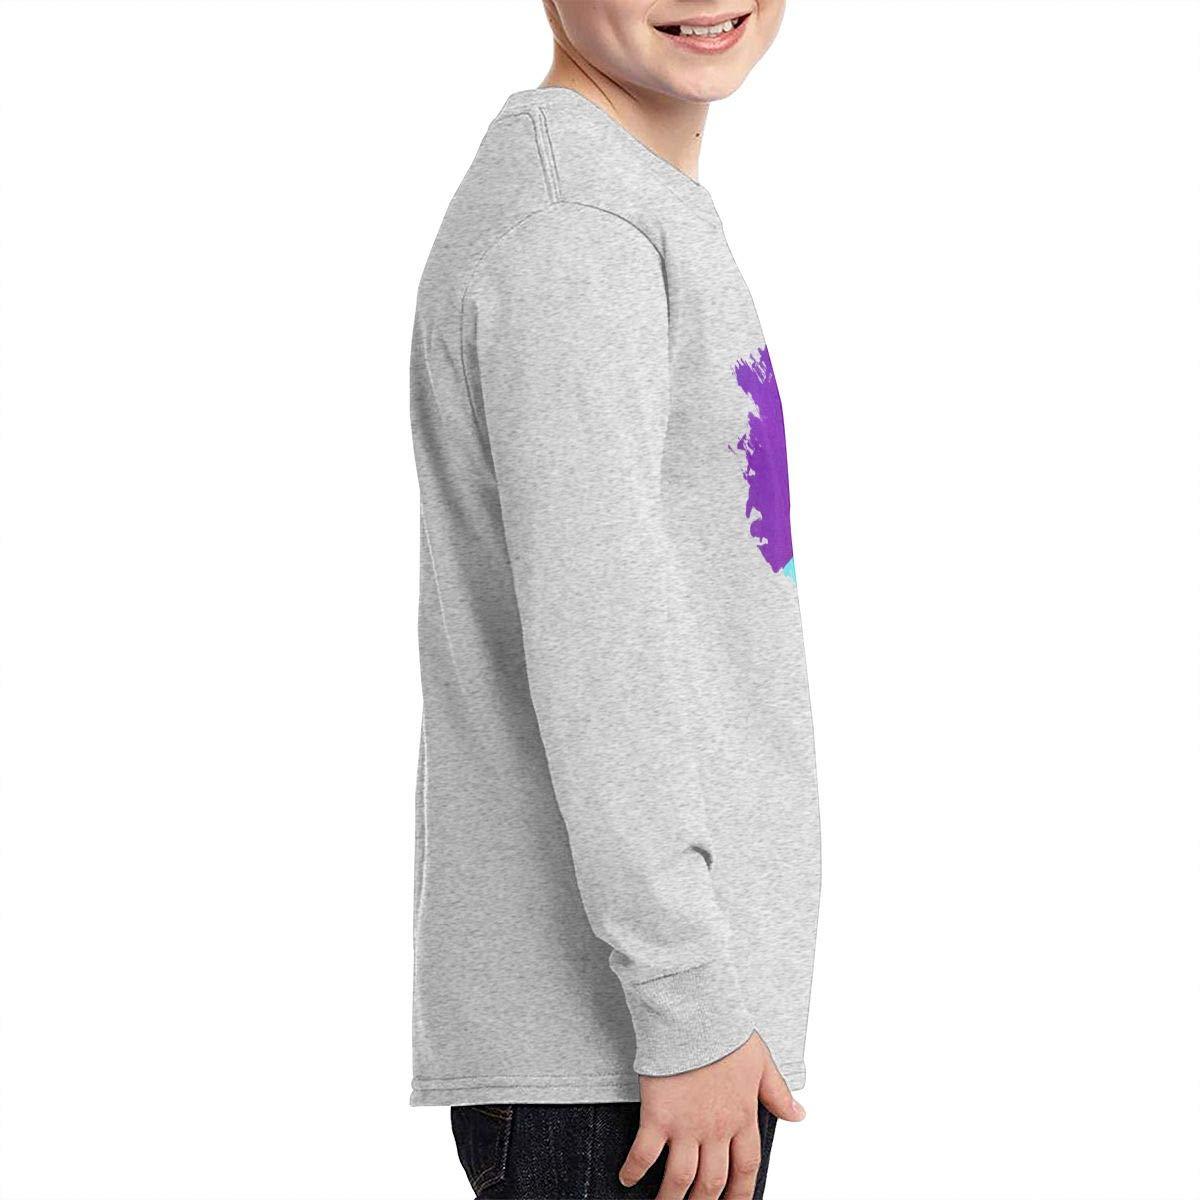 HangHisi Ninja Boys /& Girls O Neck Regular Style Tee Long Sleeve T Shirt Leisure Black